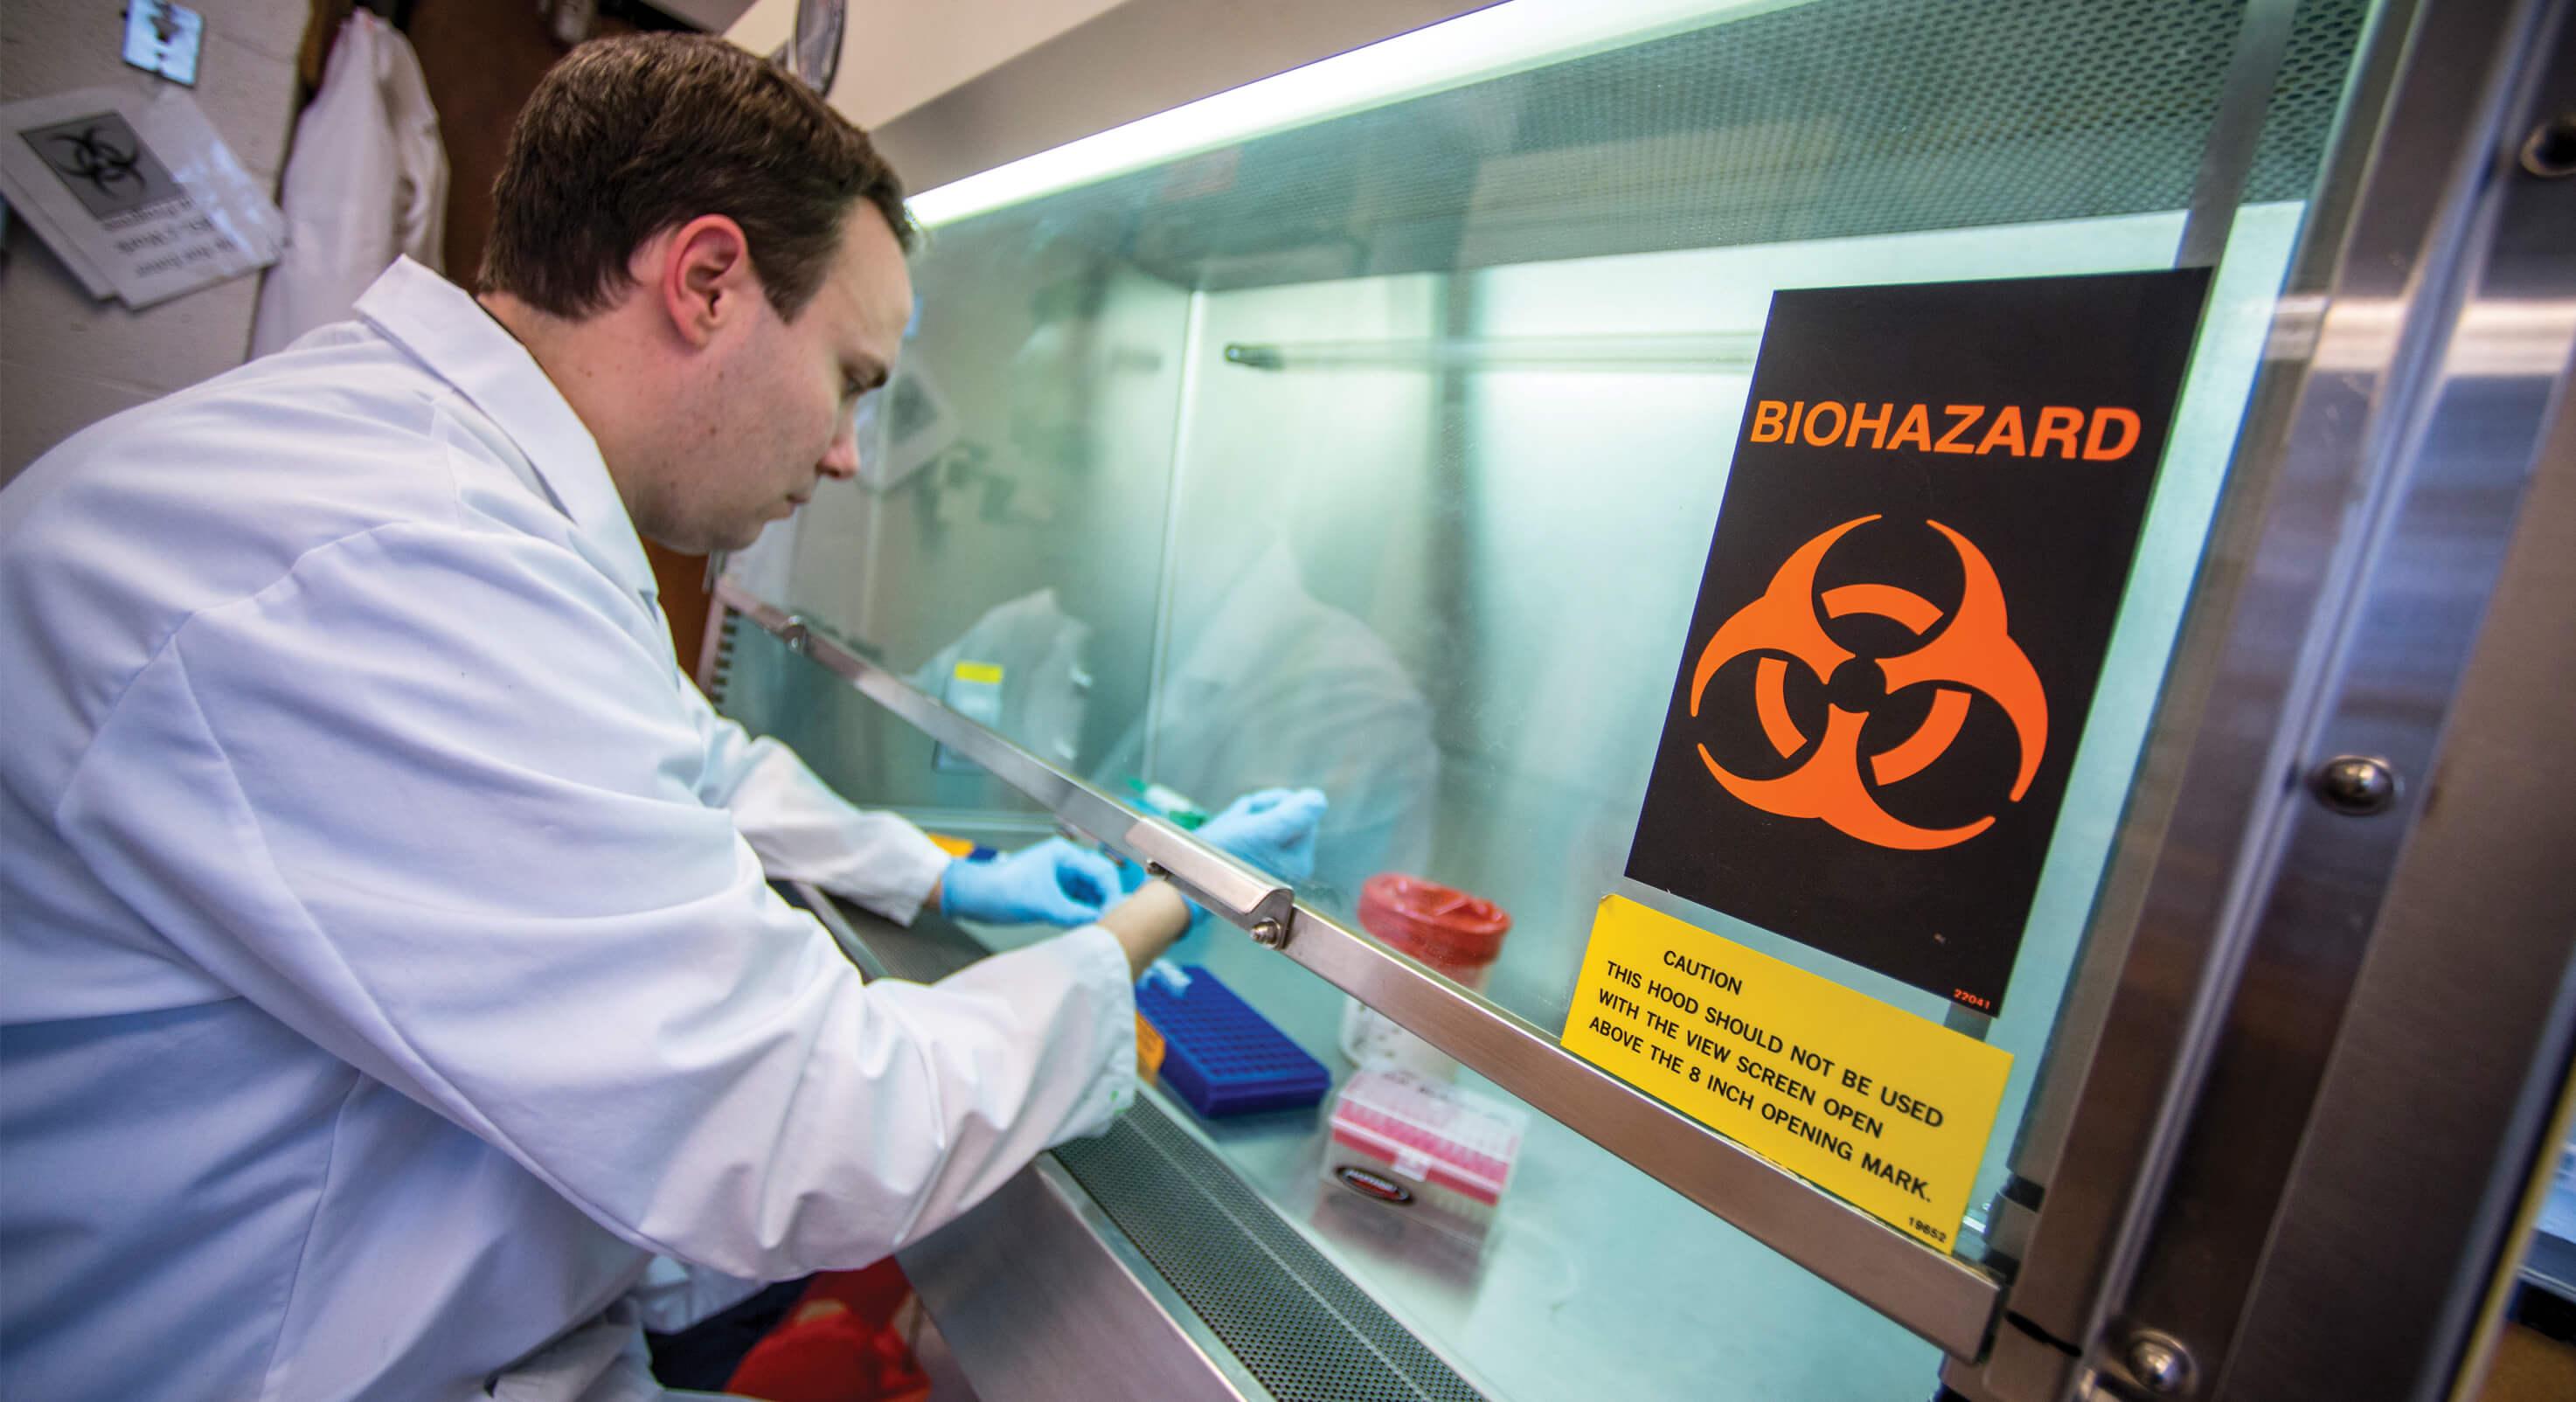 Biohazard-1-1-1-1-1